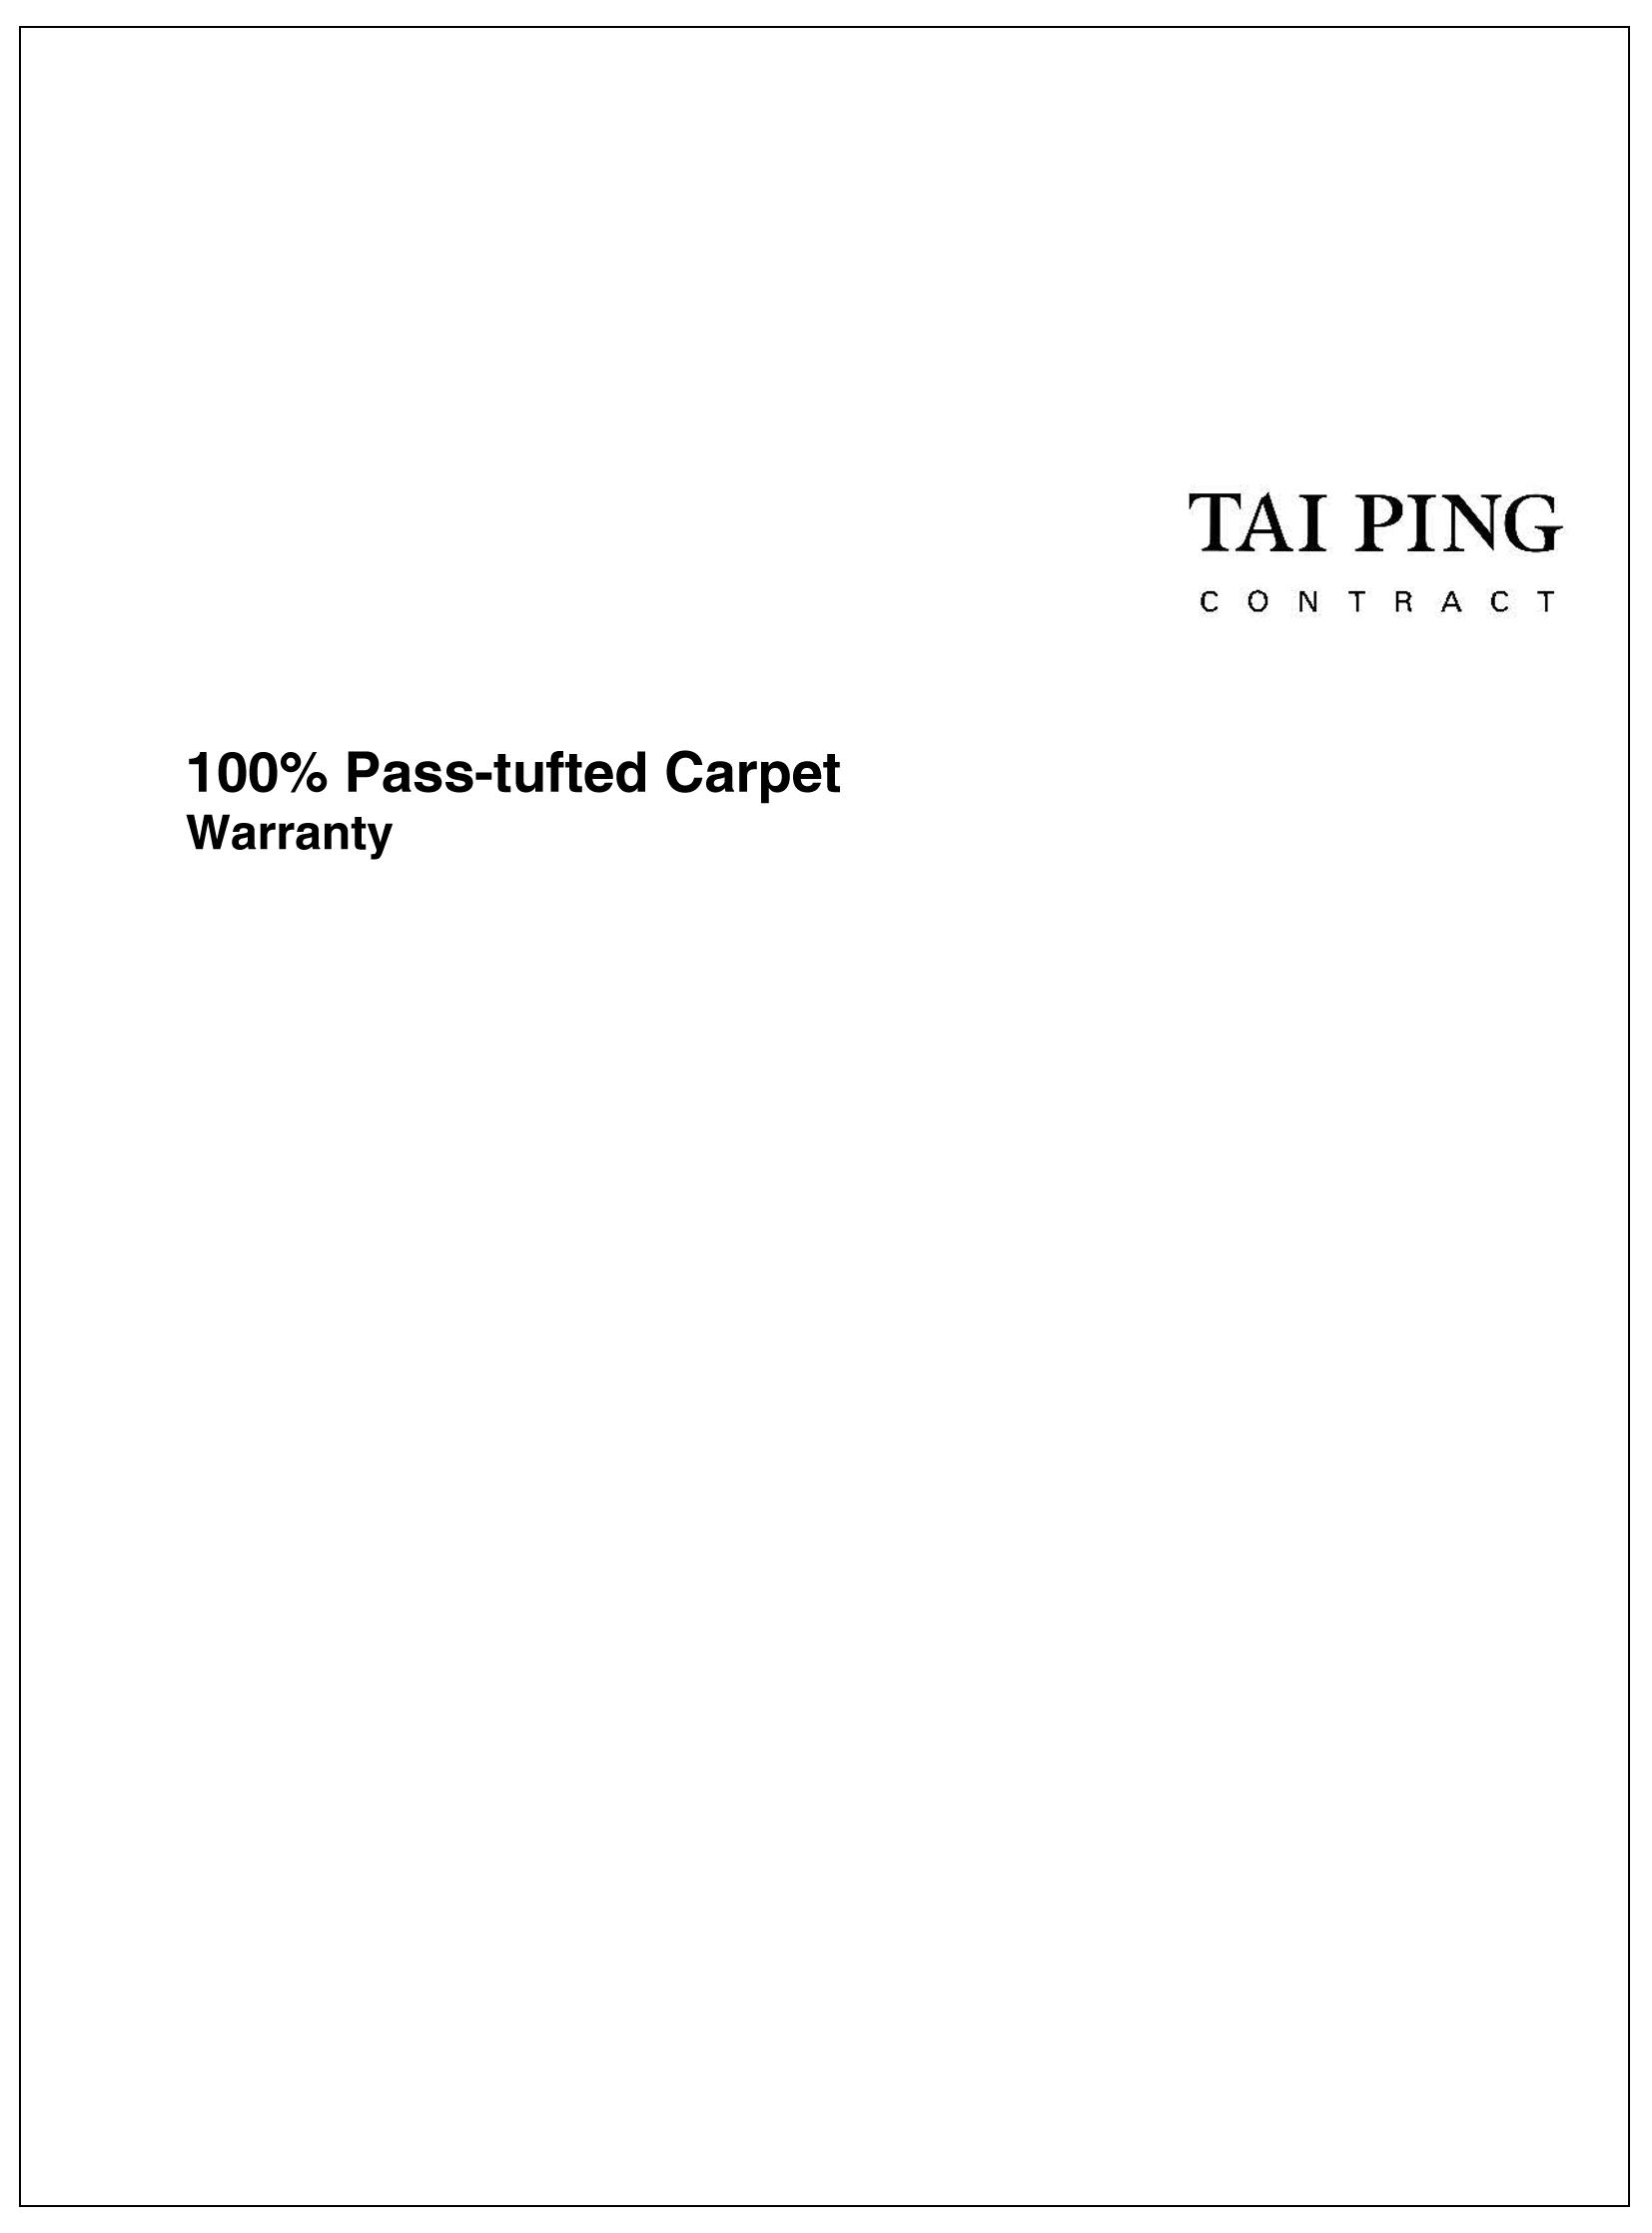 Pass-tufted Warranty